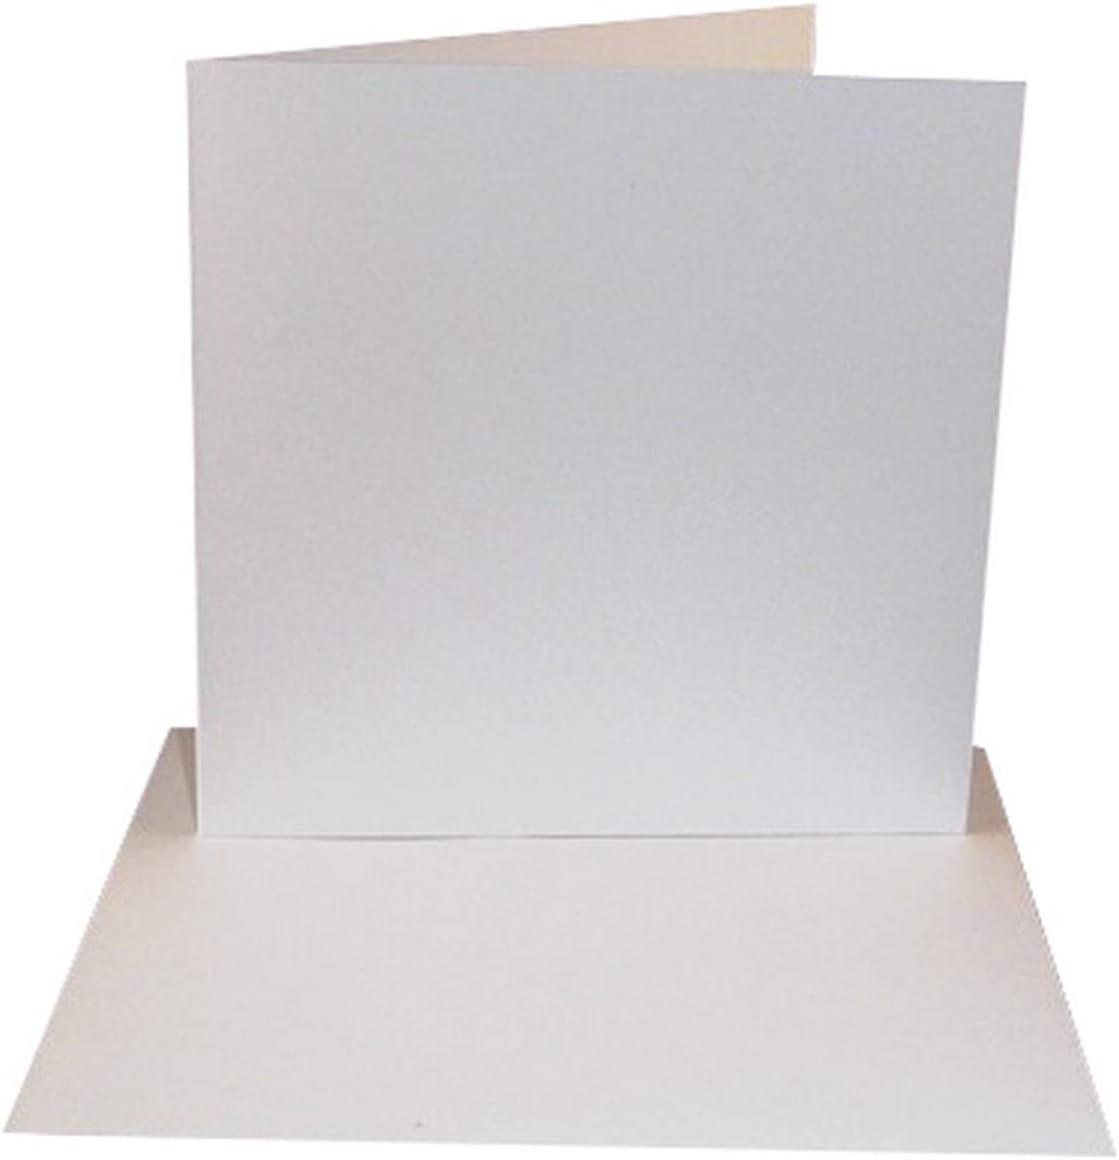 "50 x White 5/"" x 5/"" Square Card Blanks and Envelopes"